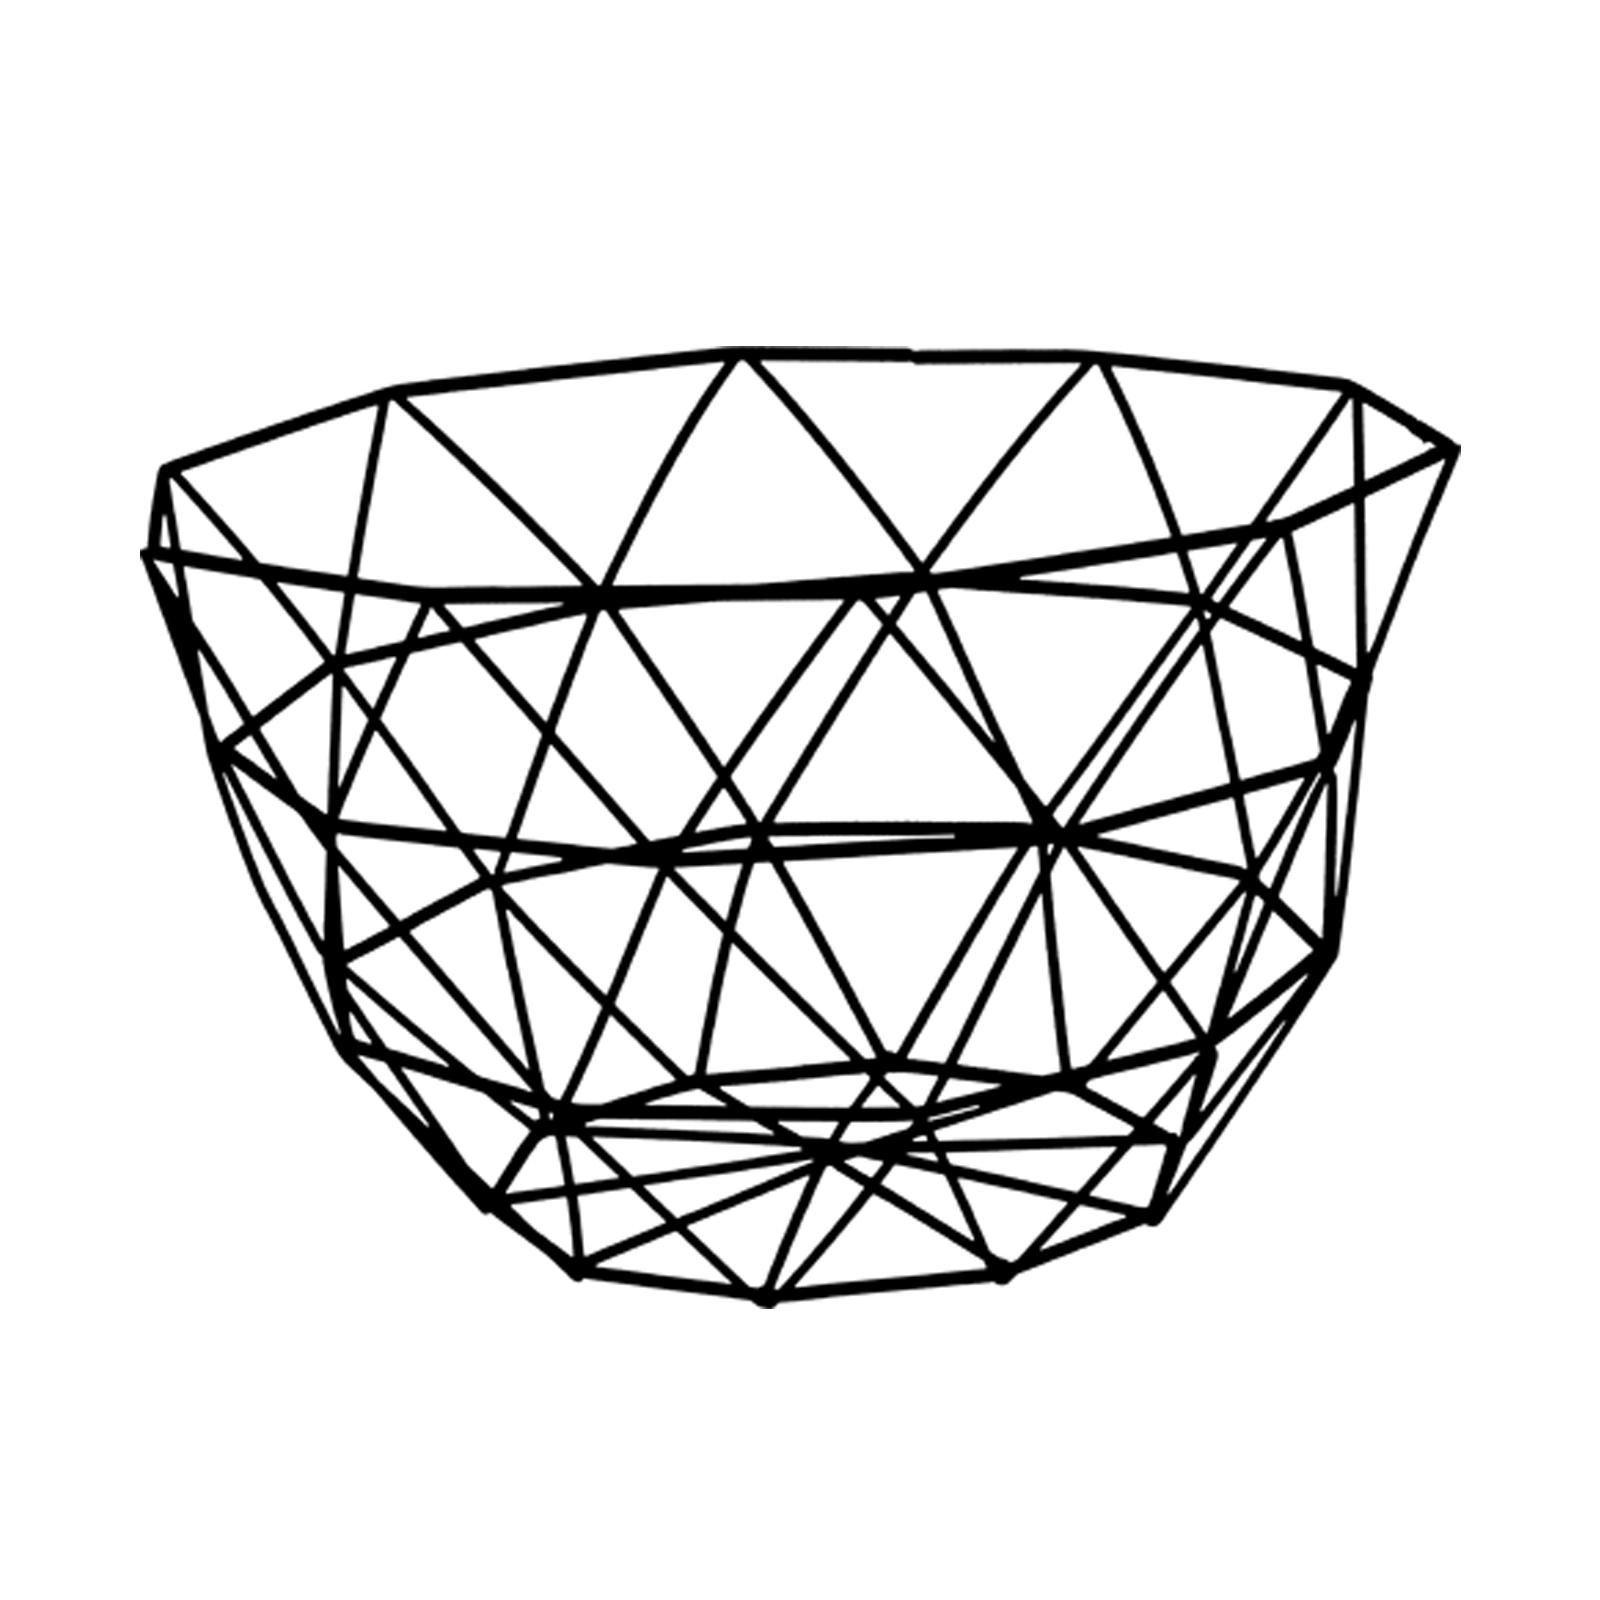 obstkorb gitterkorb drahtkorb metall korb draht brotkorb kartoffelkorb dekokorb ebay. Black Bedroom Furniture Sets. Home Design Ideas